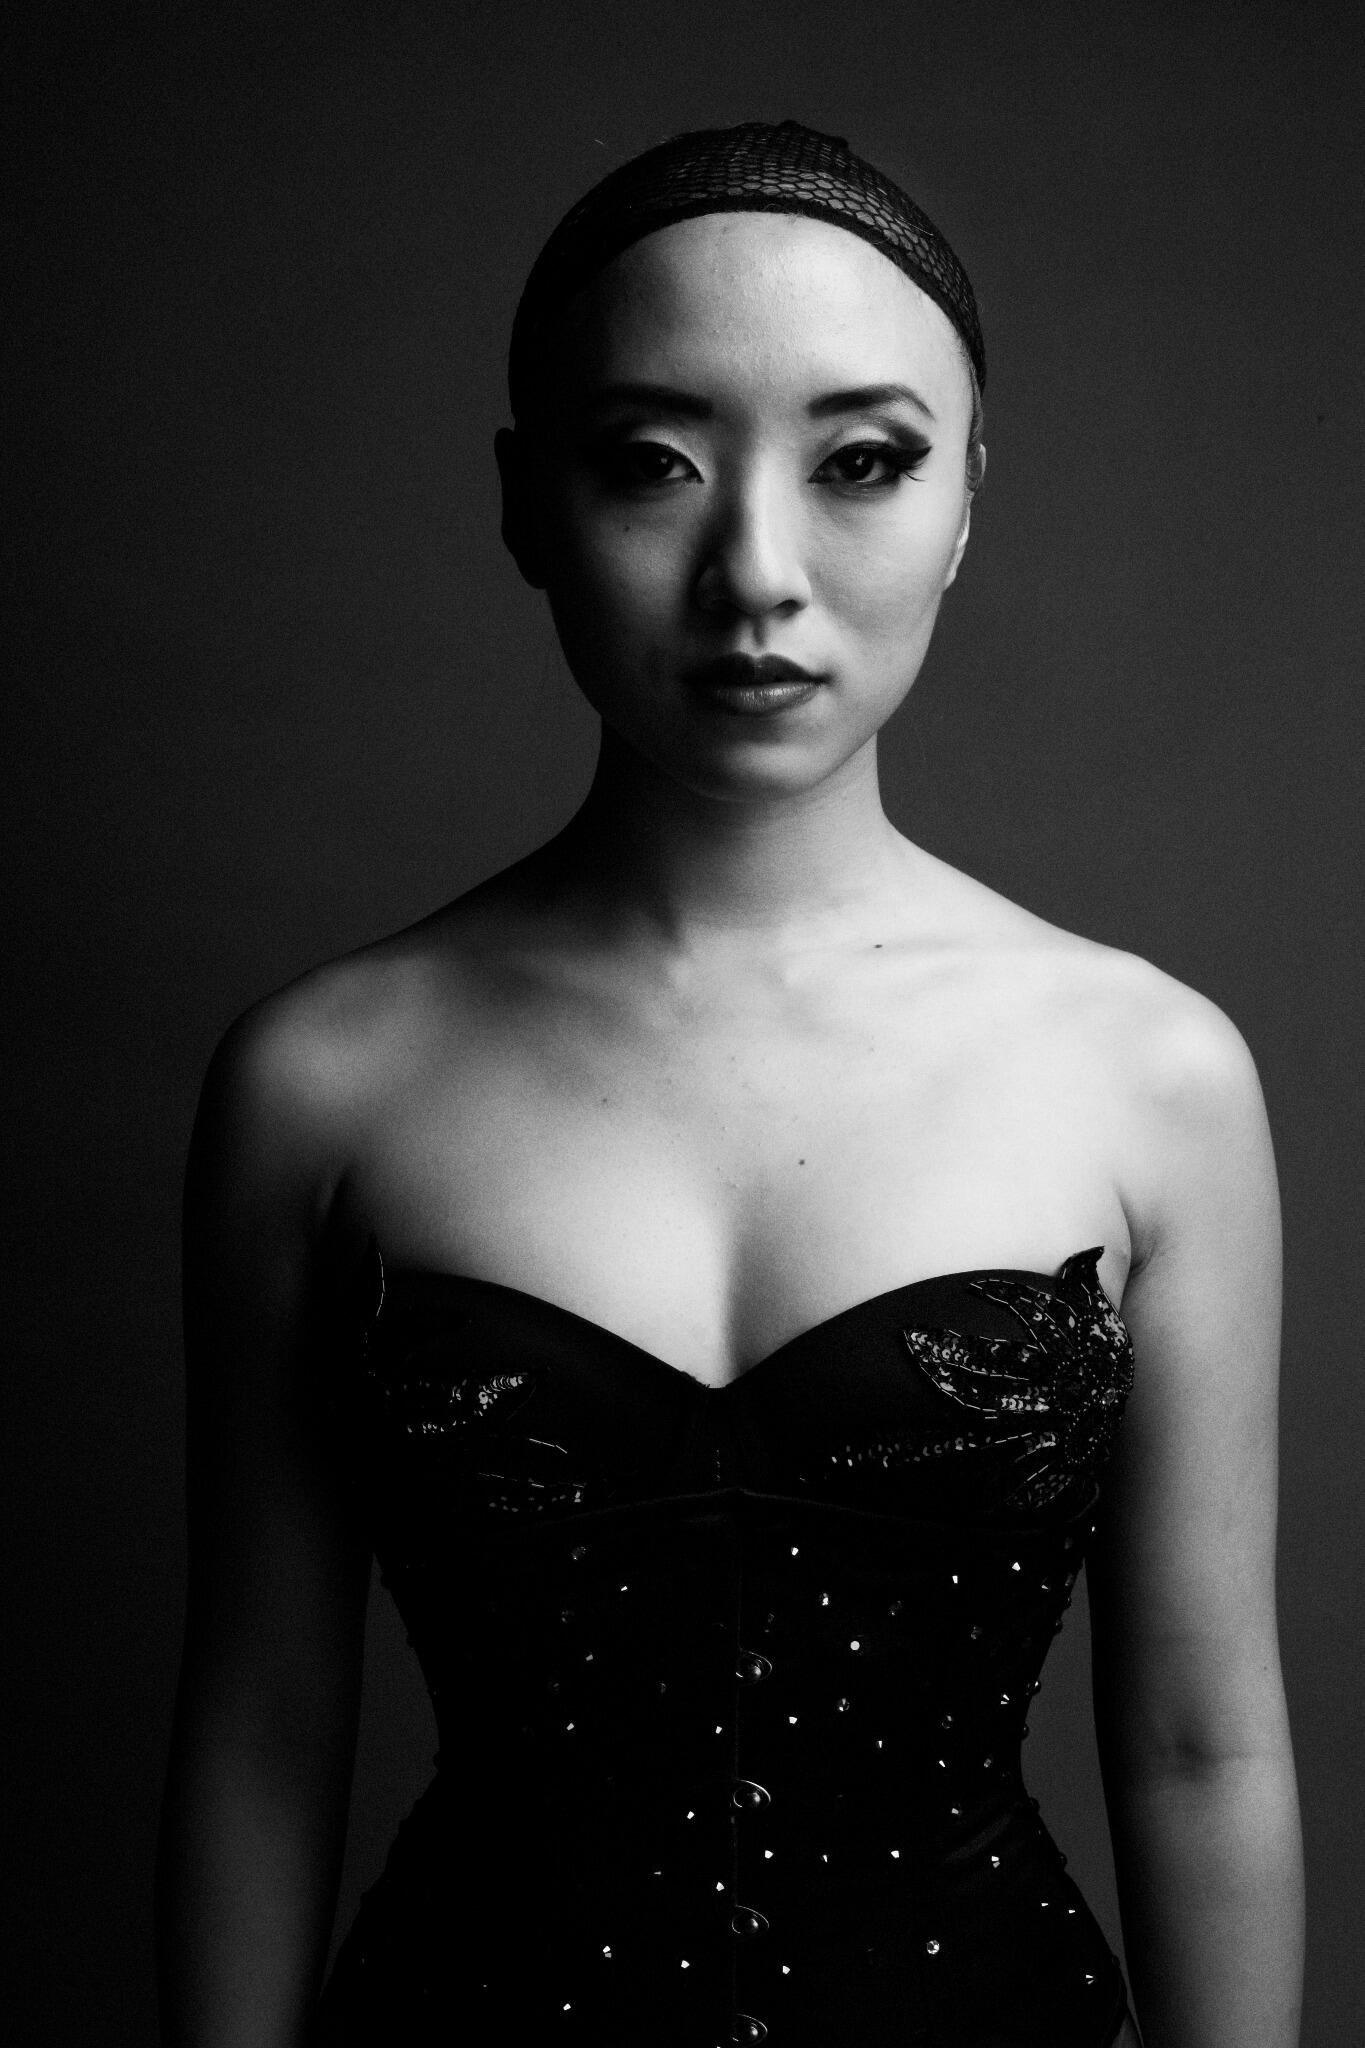 beautiful_black_and_white_portrait_photography_76.jpg